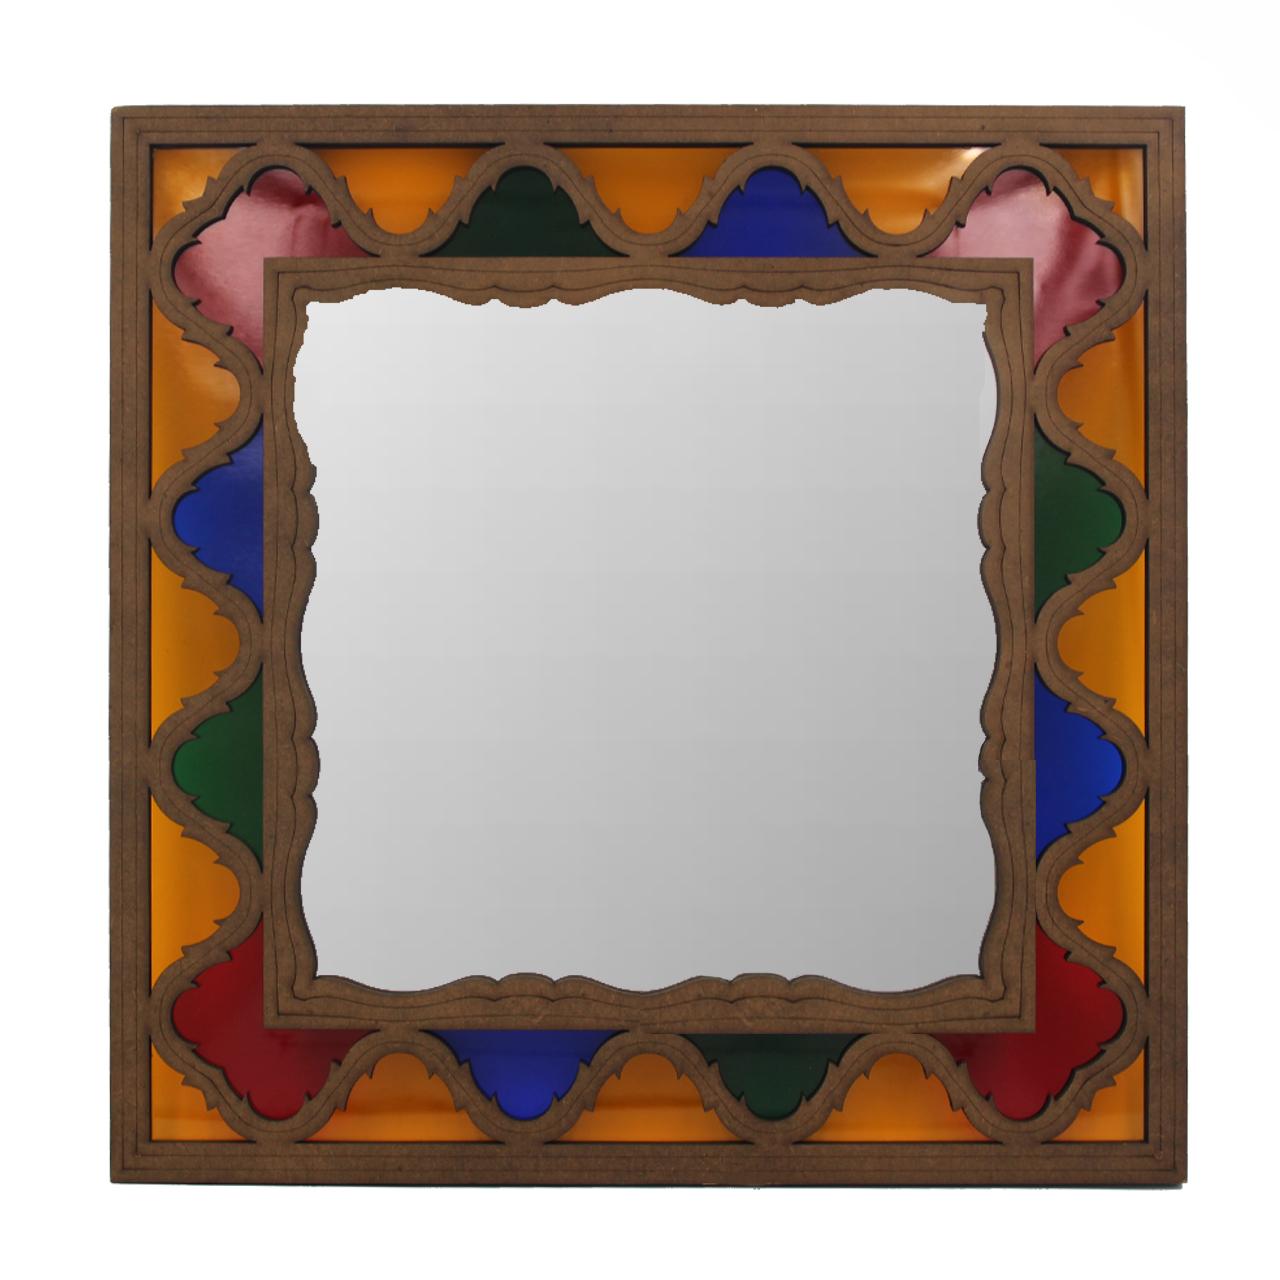 آیینه پلکسی مدل اسپهبد 22